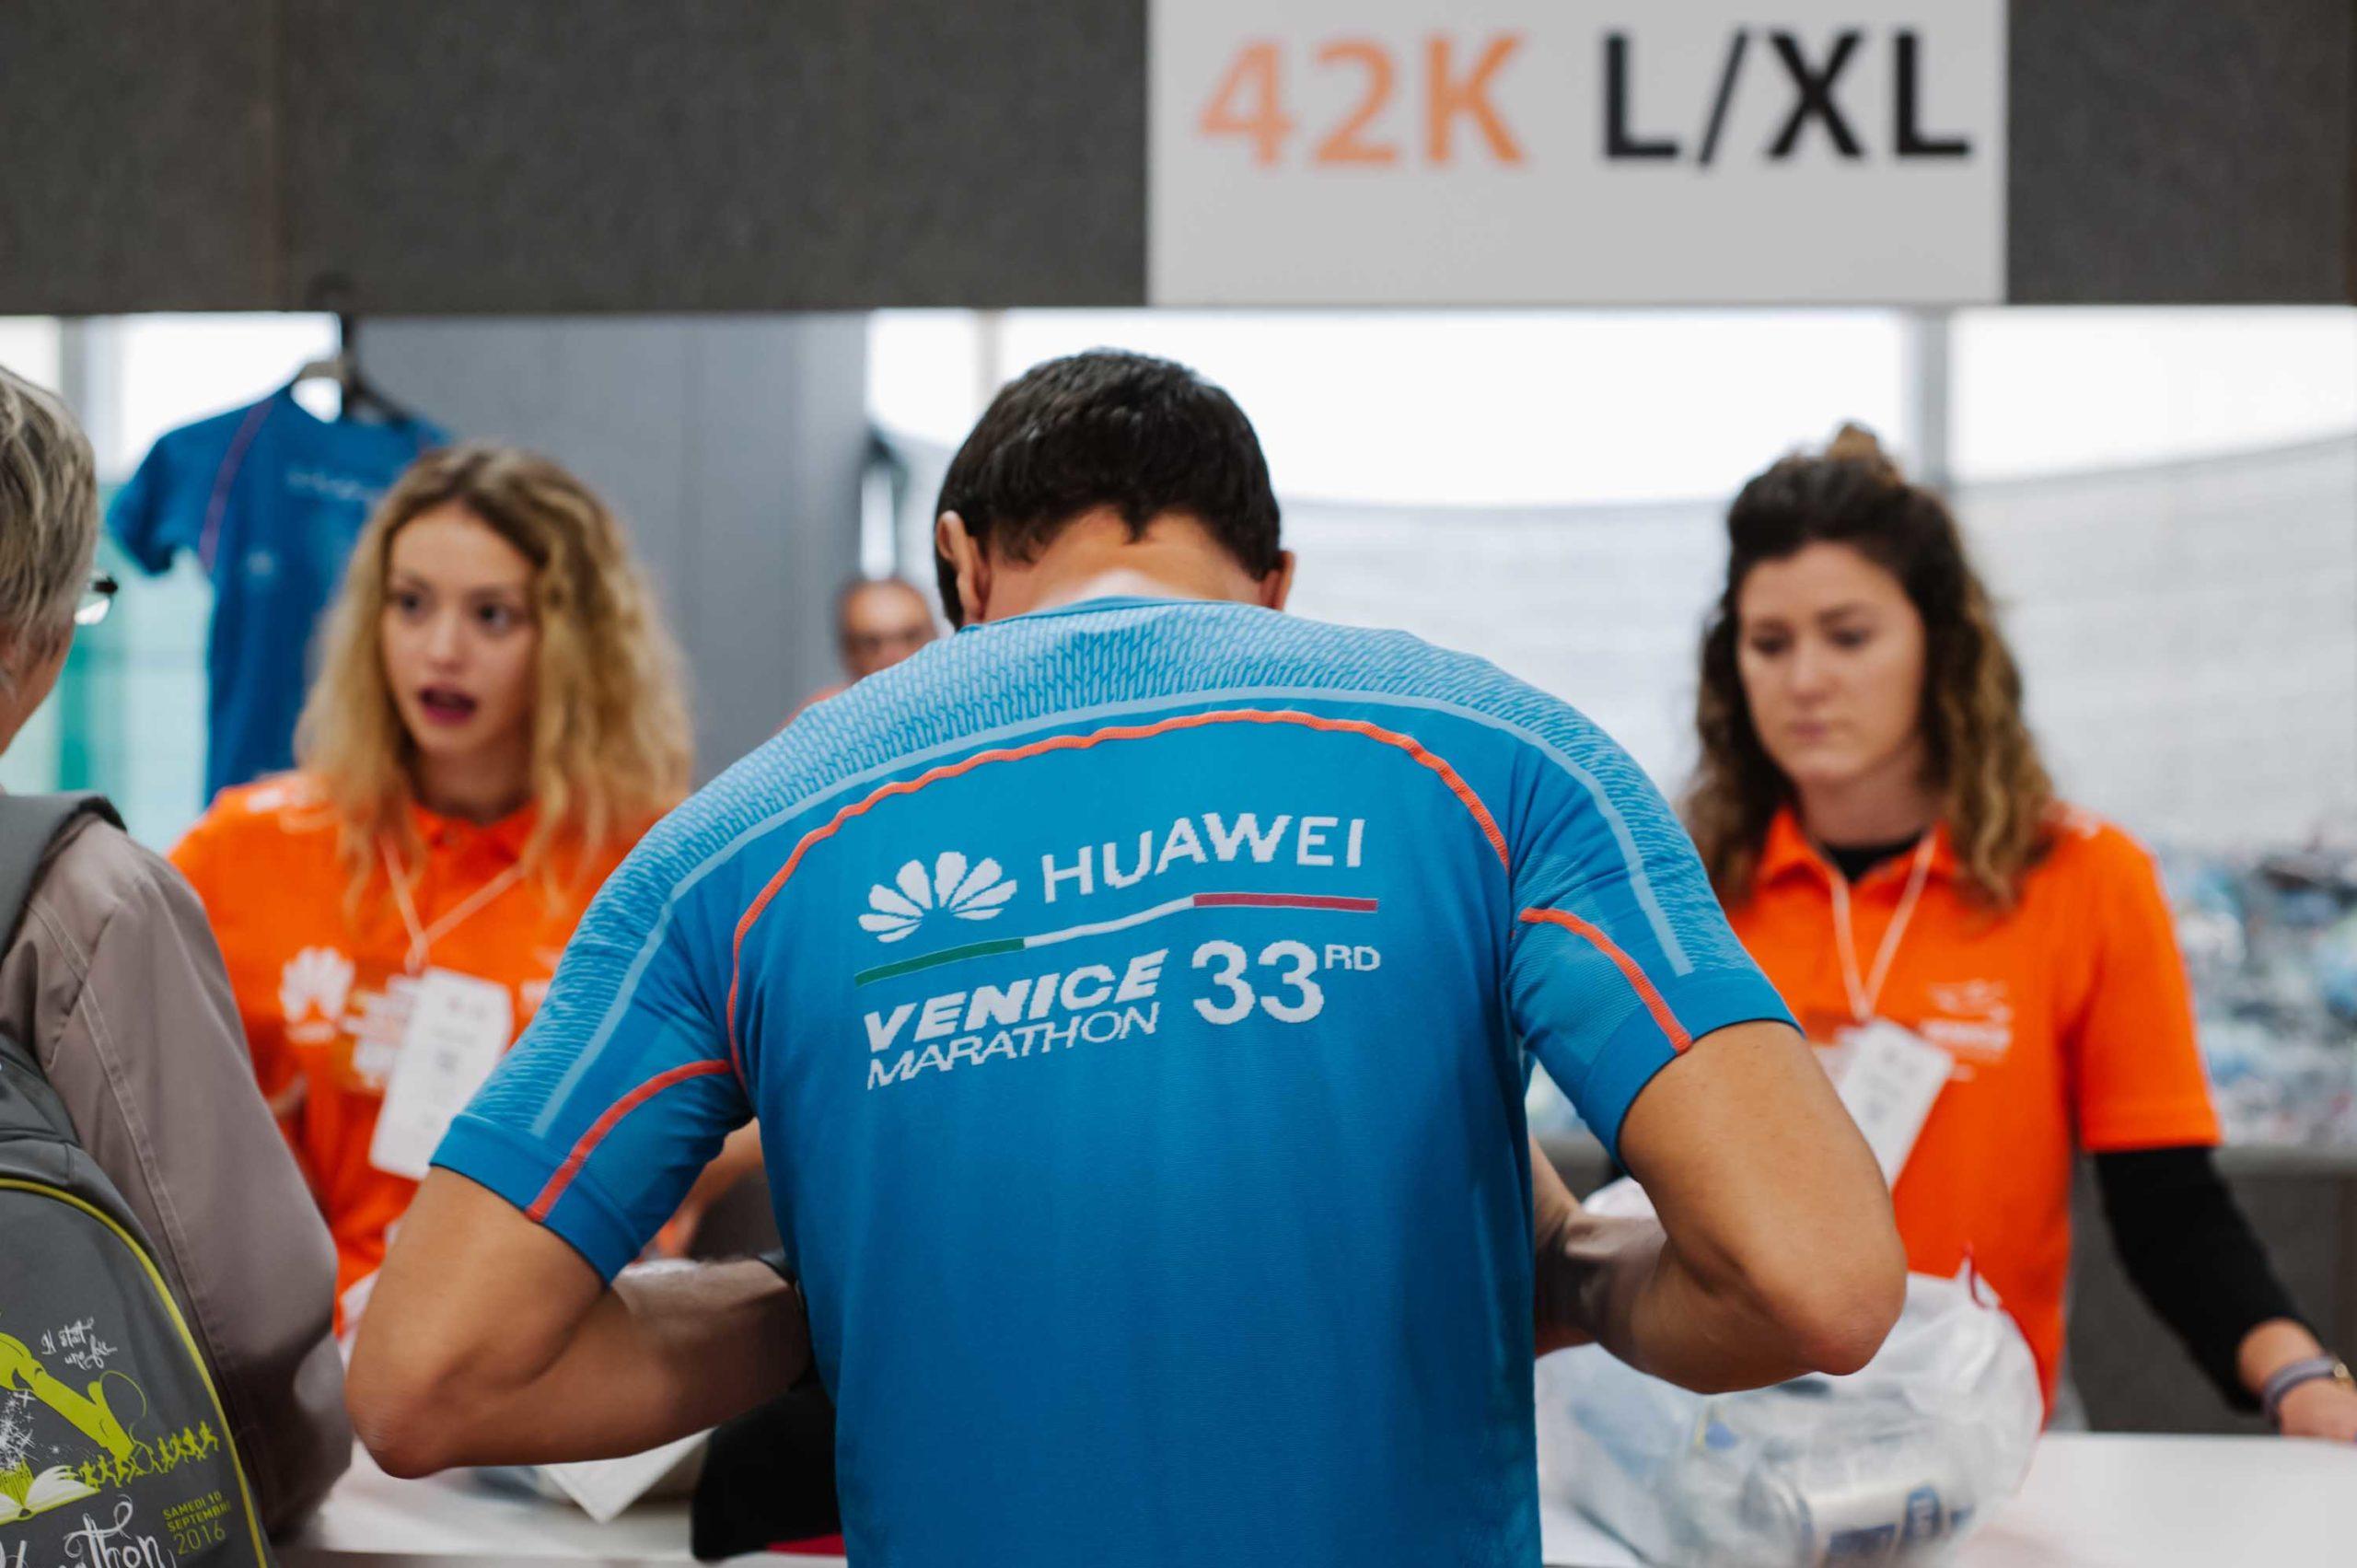 Huawei Marathon venezia concorrente